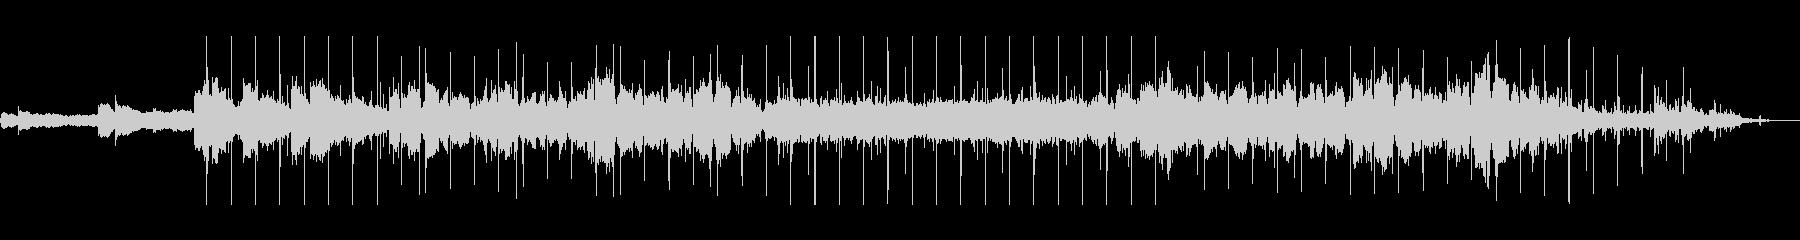 Ambient lo-fi beat's unreproduced waveform